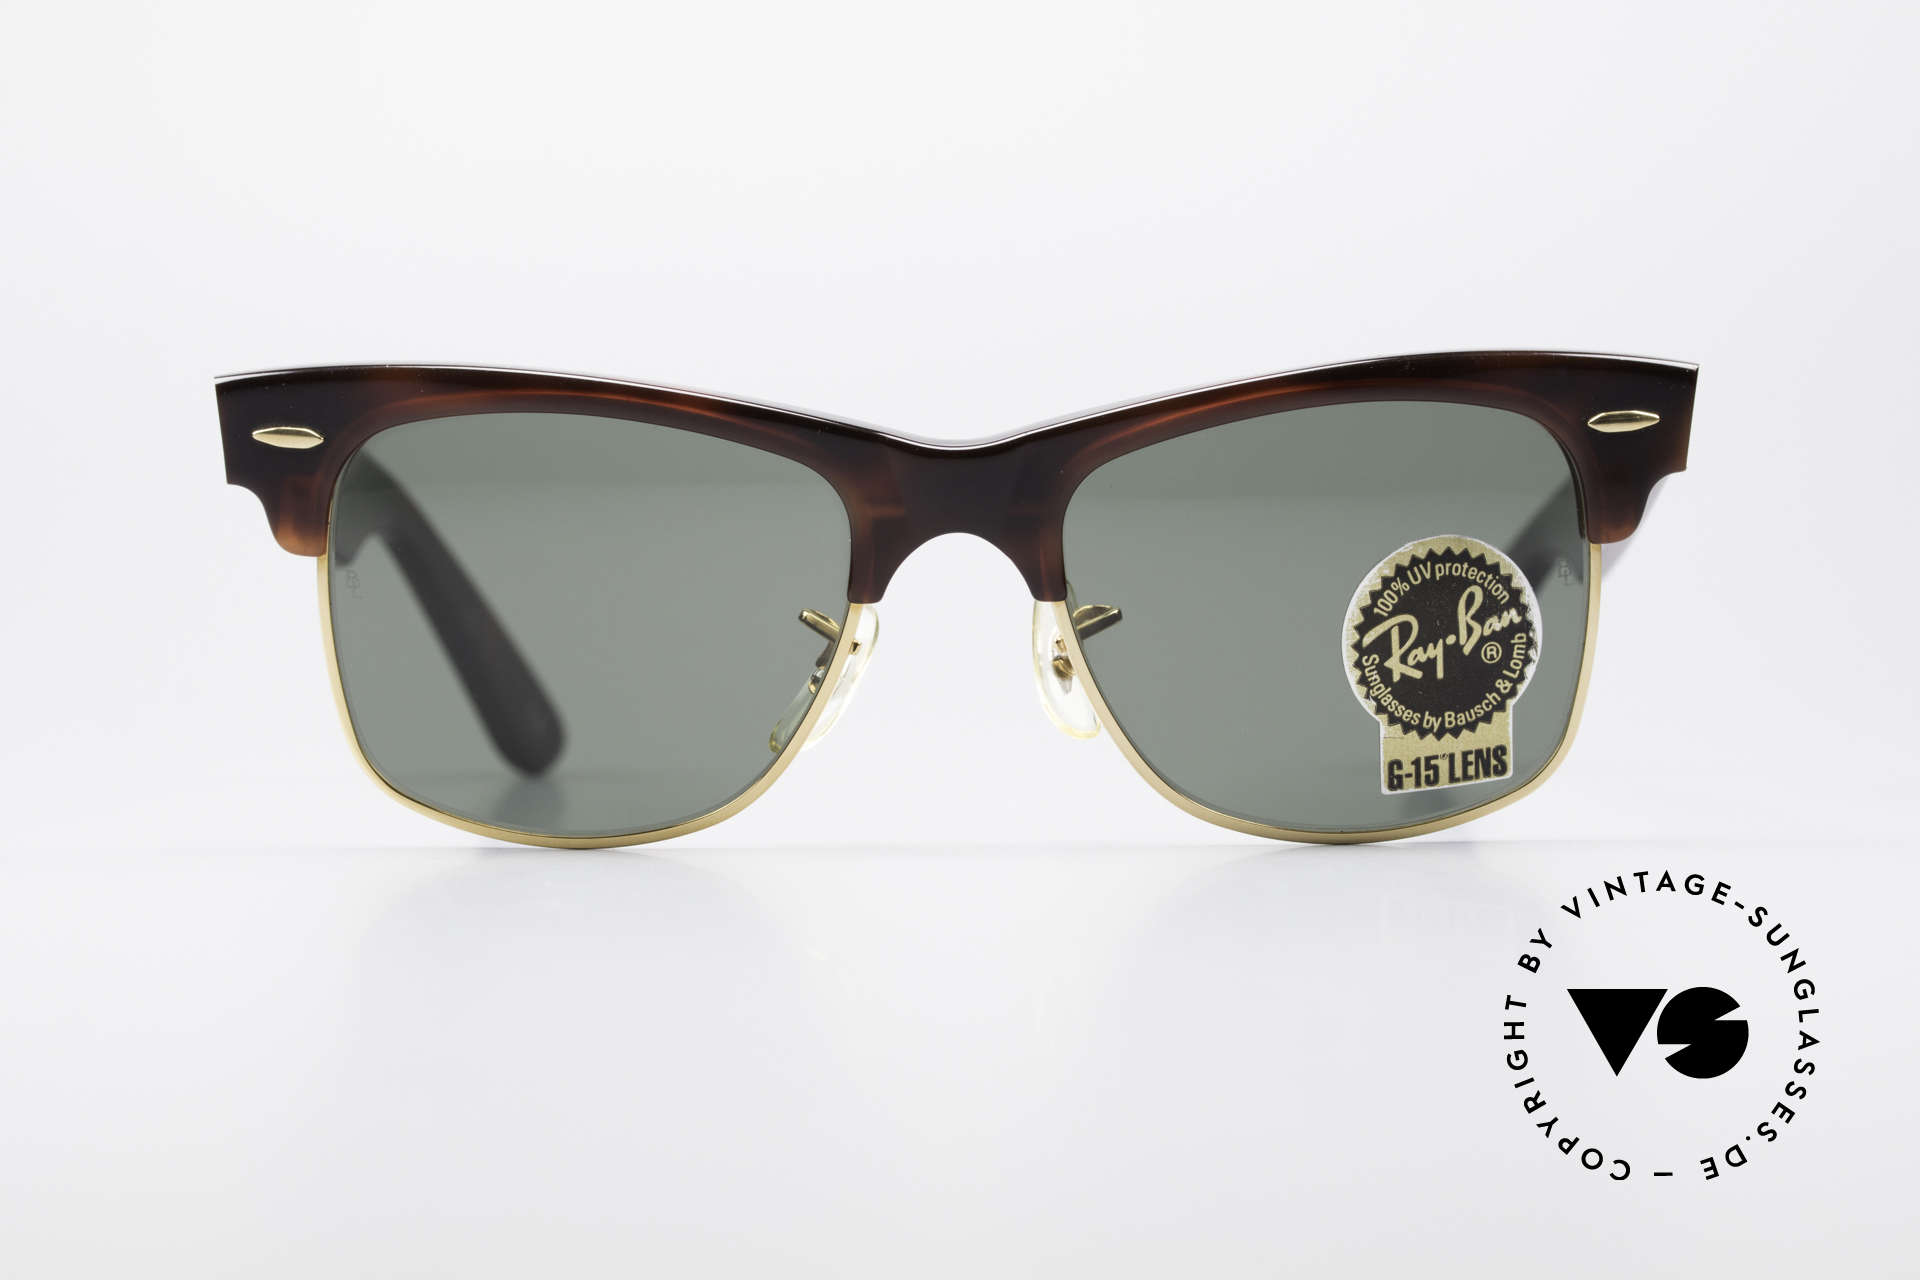 4e09ed1cf7a833 Sonnenbrillen Ray Ban Wayfarer Max Original B&L USA Sonnenbrille ...